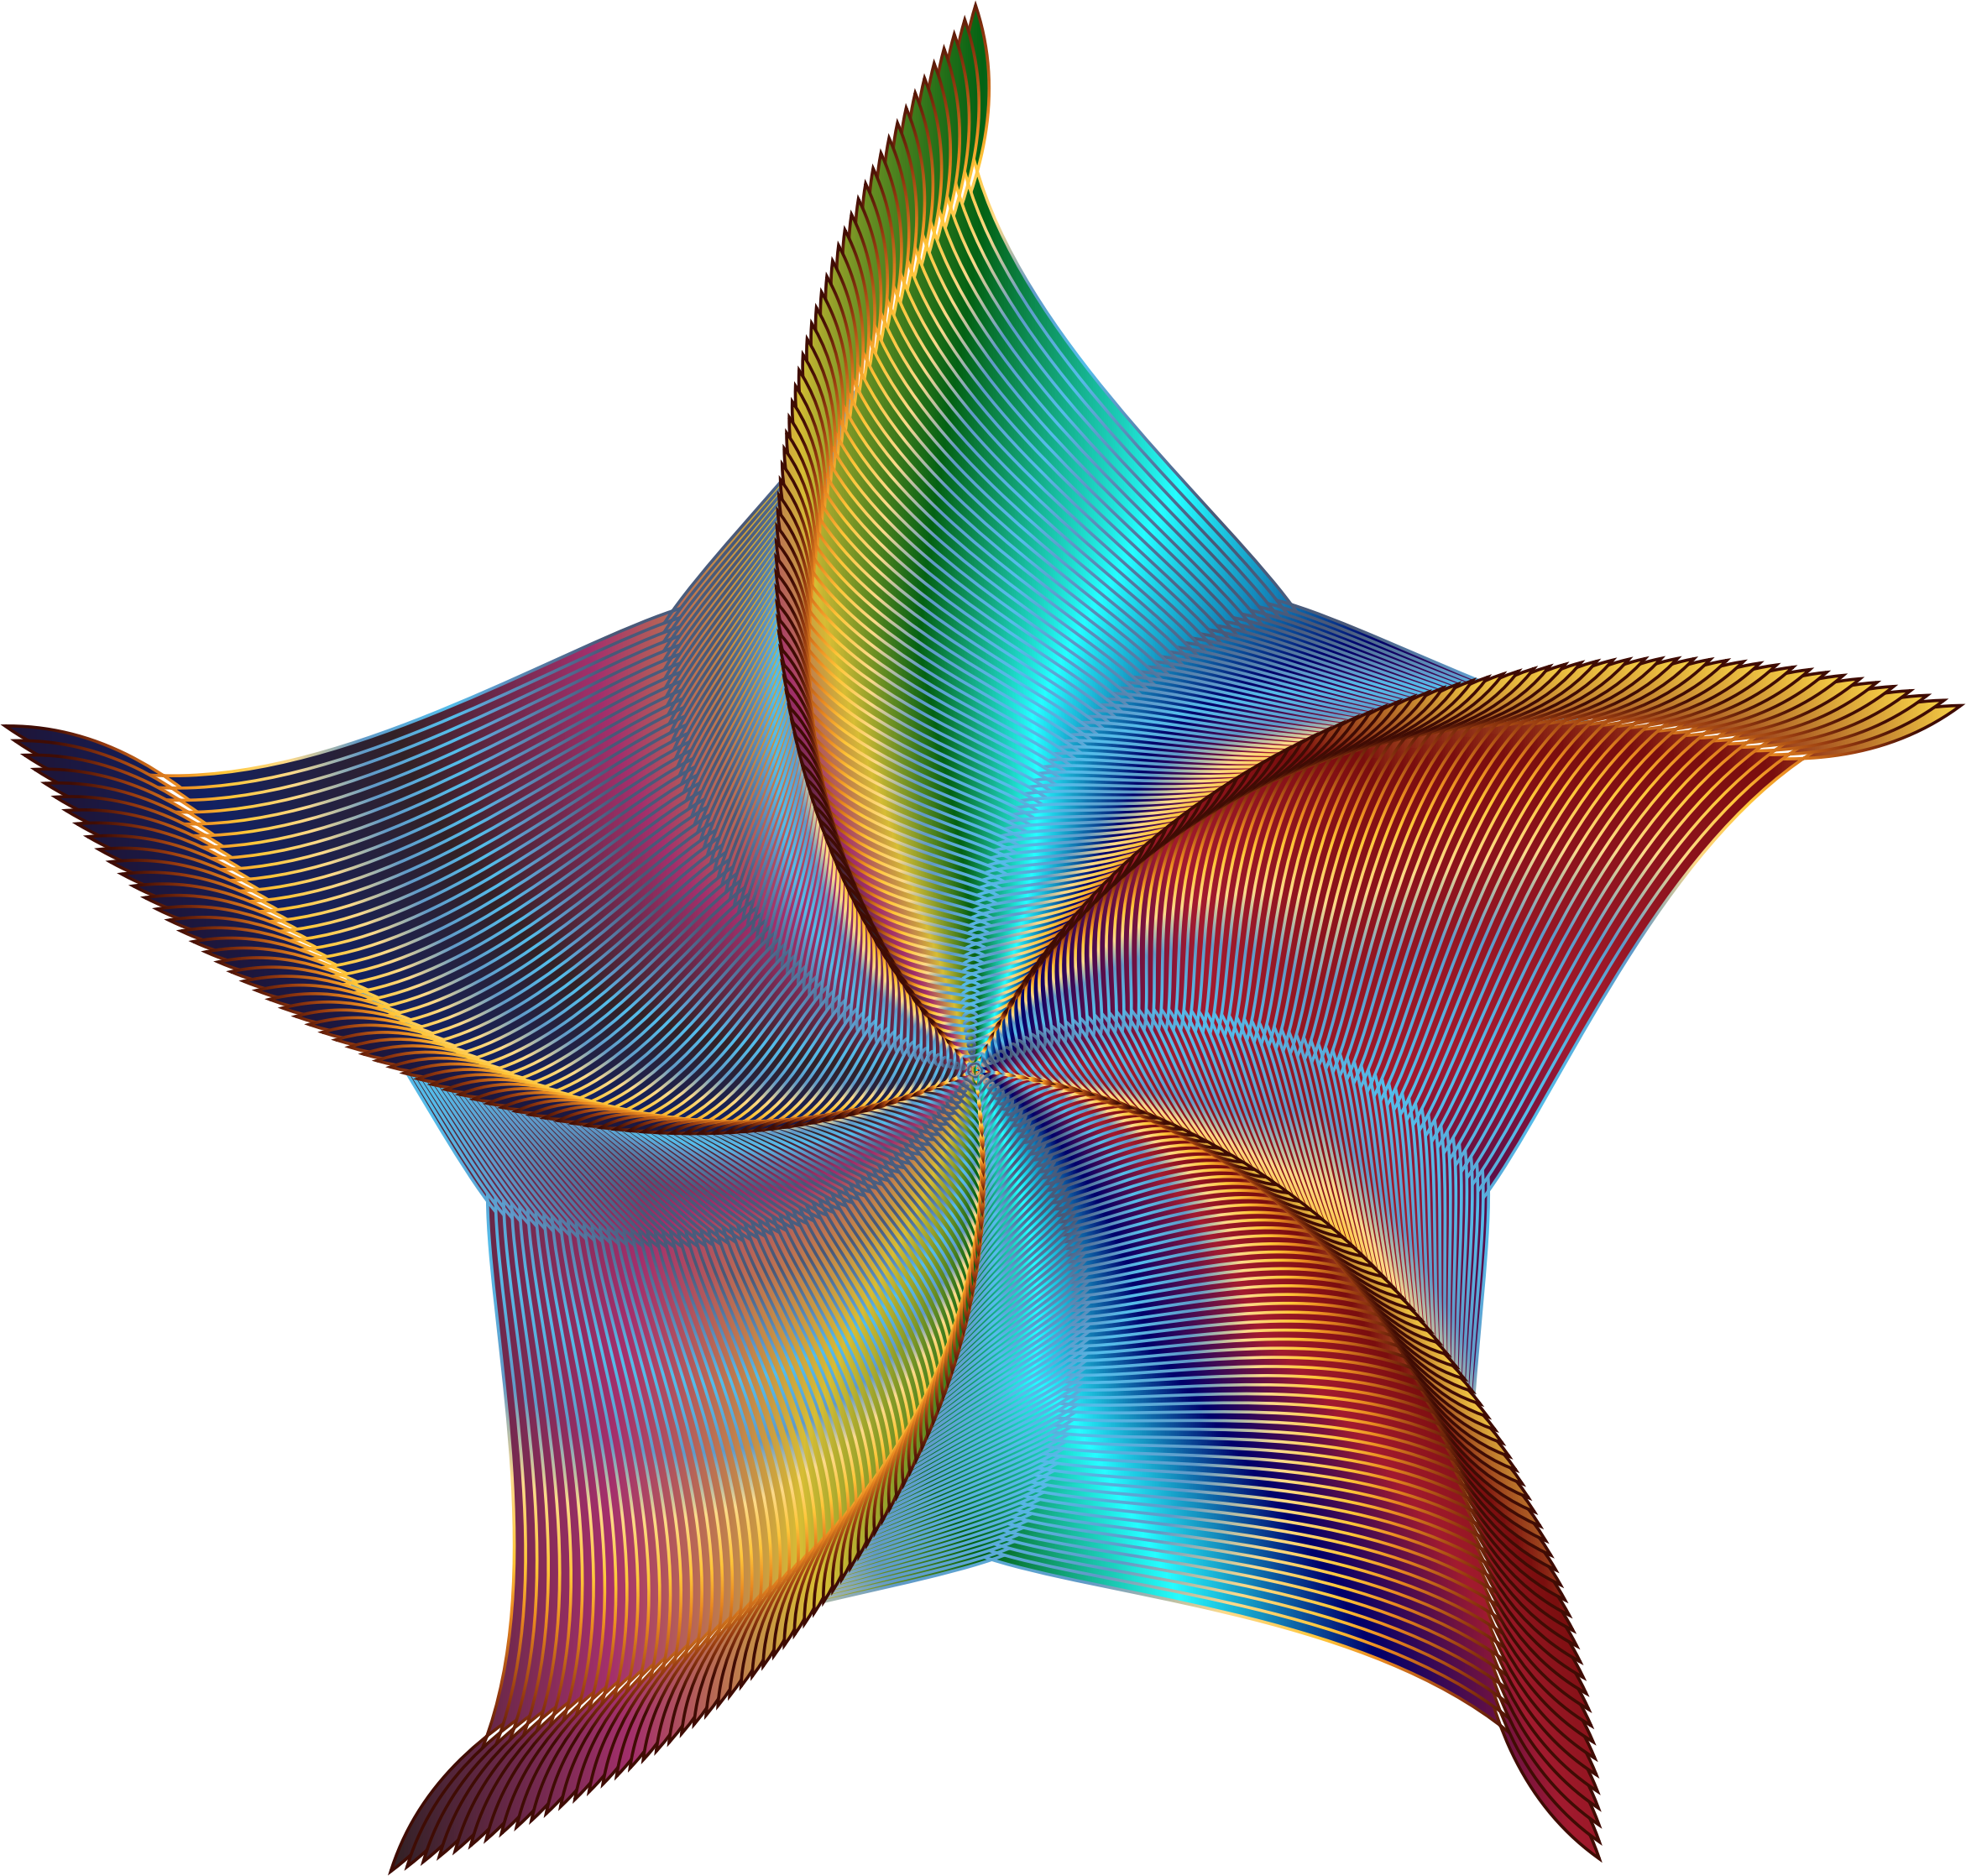 Prismatic Colored Starfish Vector Clipart image - Free ...